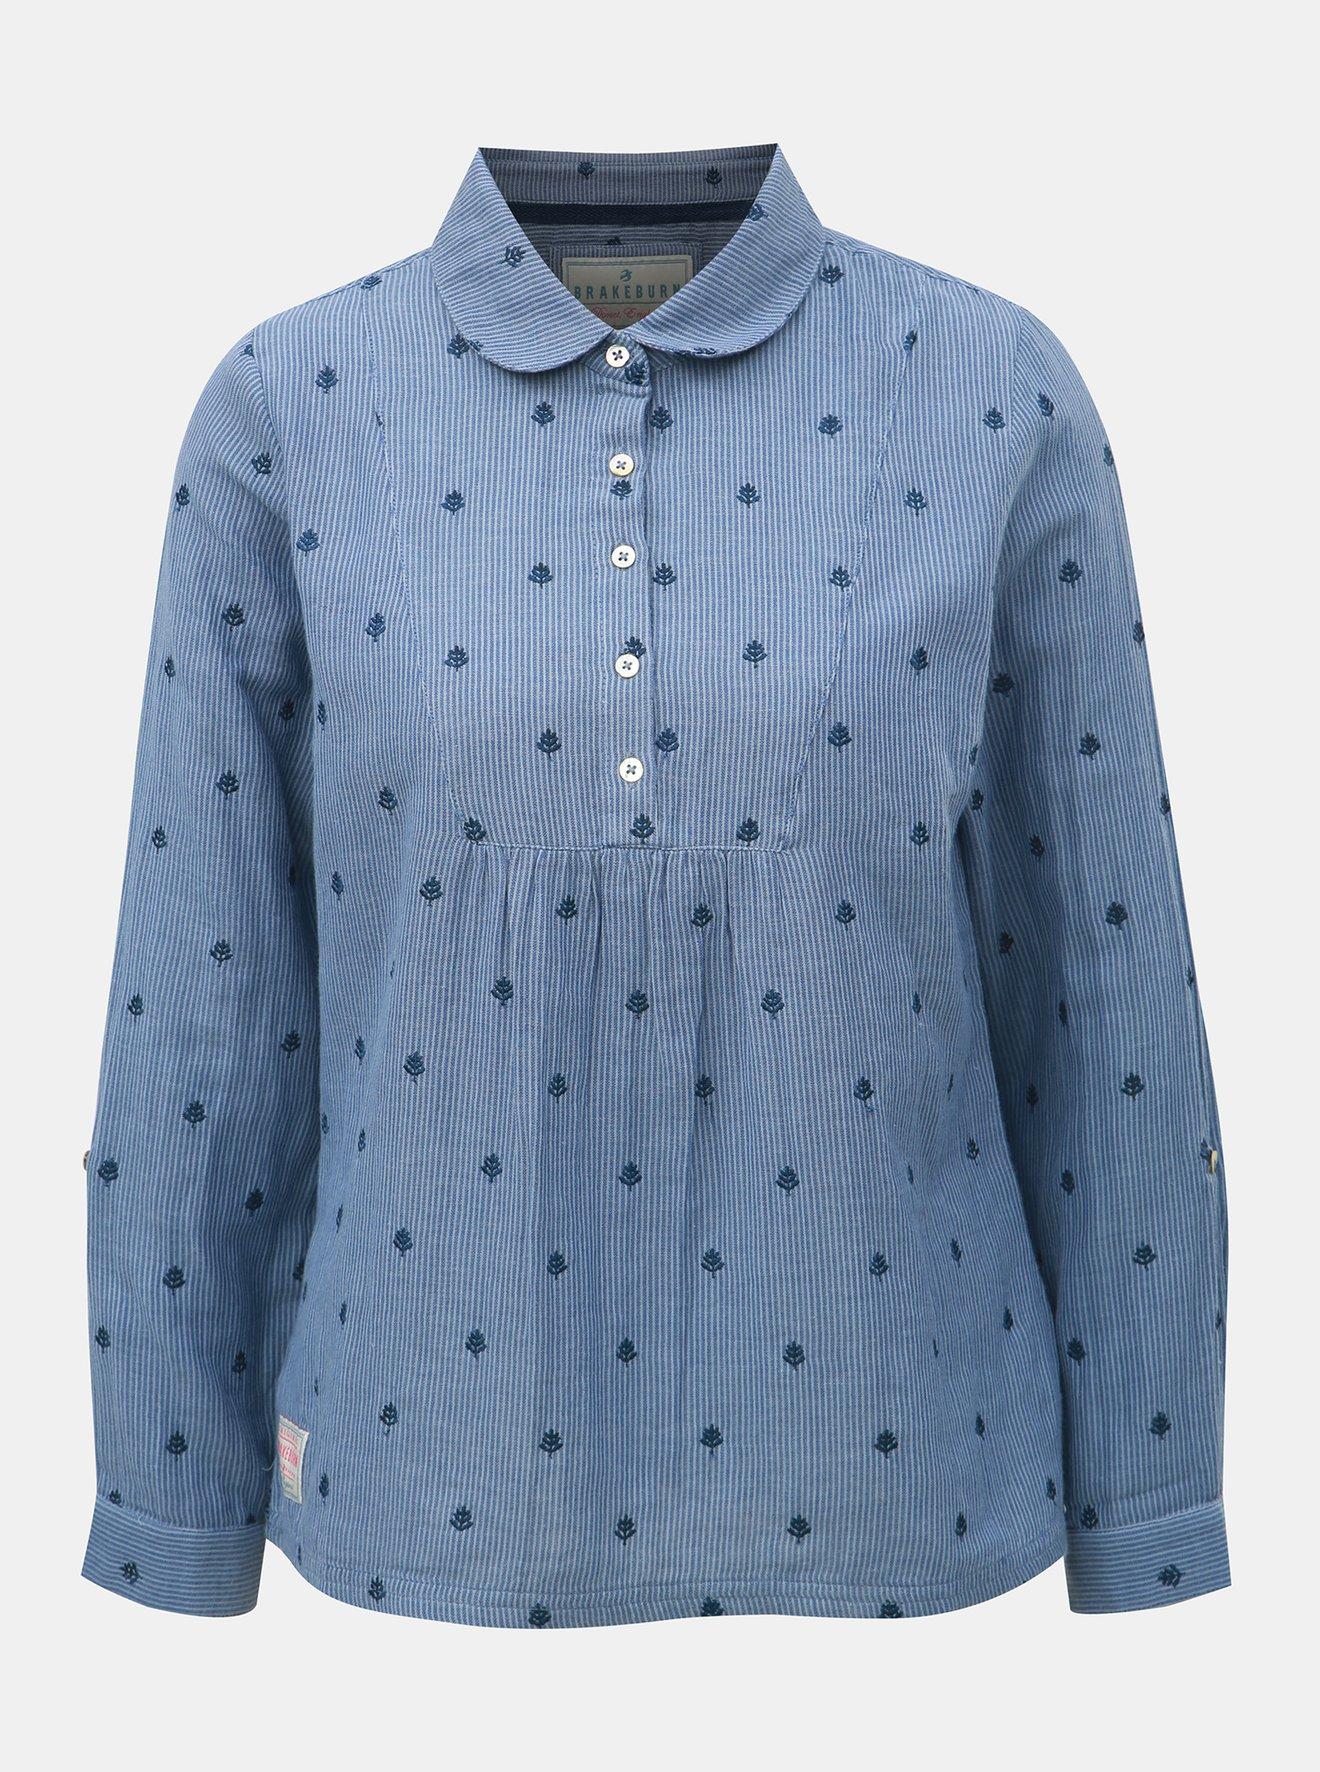 Modrá pruhovaná dámská halenka s drobnou výšivkou Brakeburn